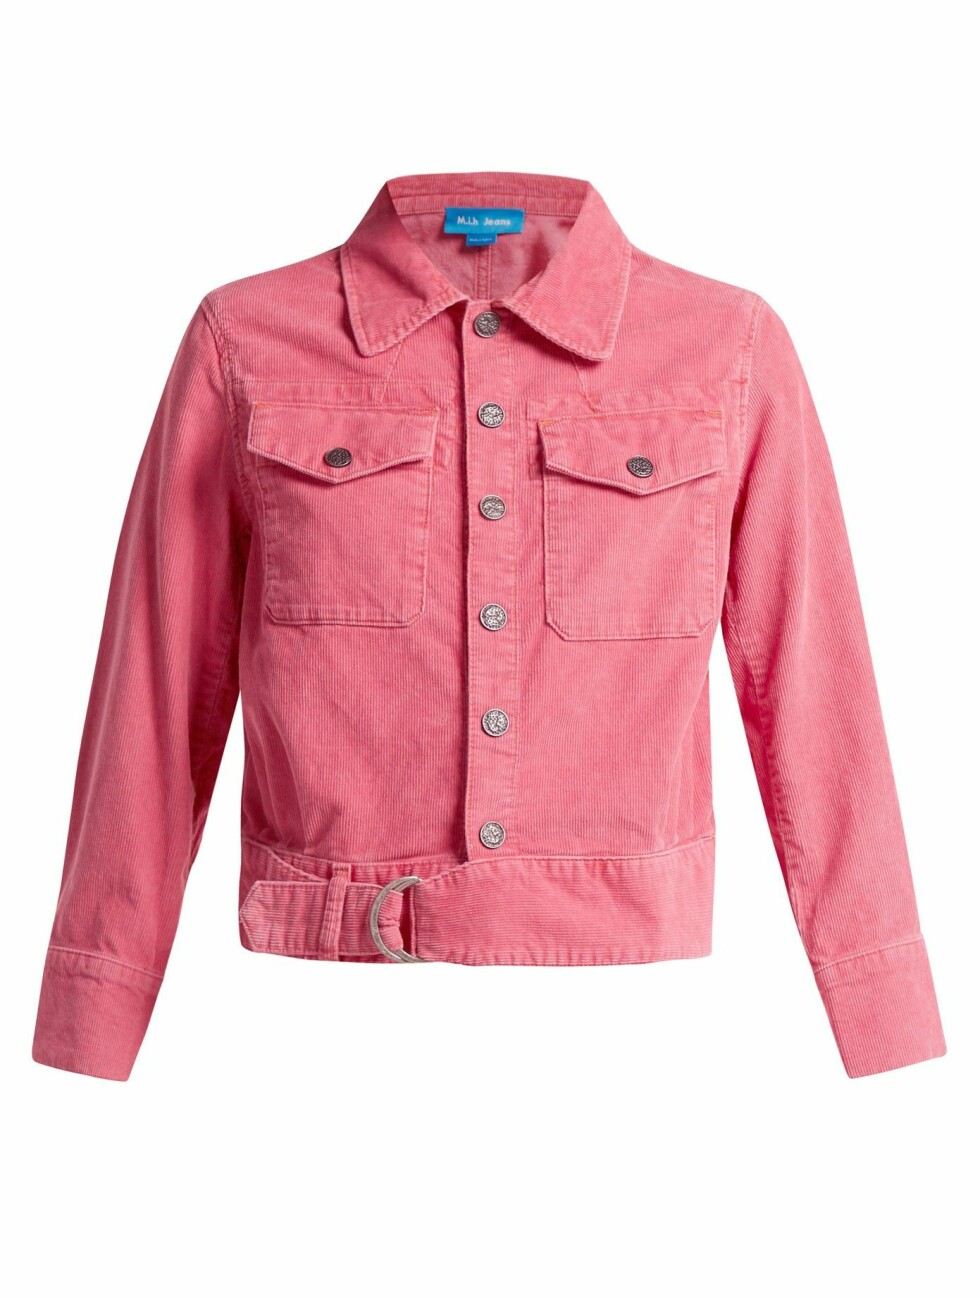 Jakke fra M.i.H Jeans |2170,-| https://www.matchesfashion.com/intl/products/M-i-h-Jeans-Paradise-cropped-corduroy-jacket-1208700